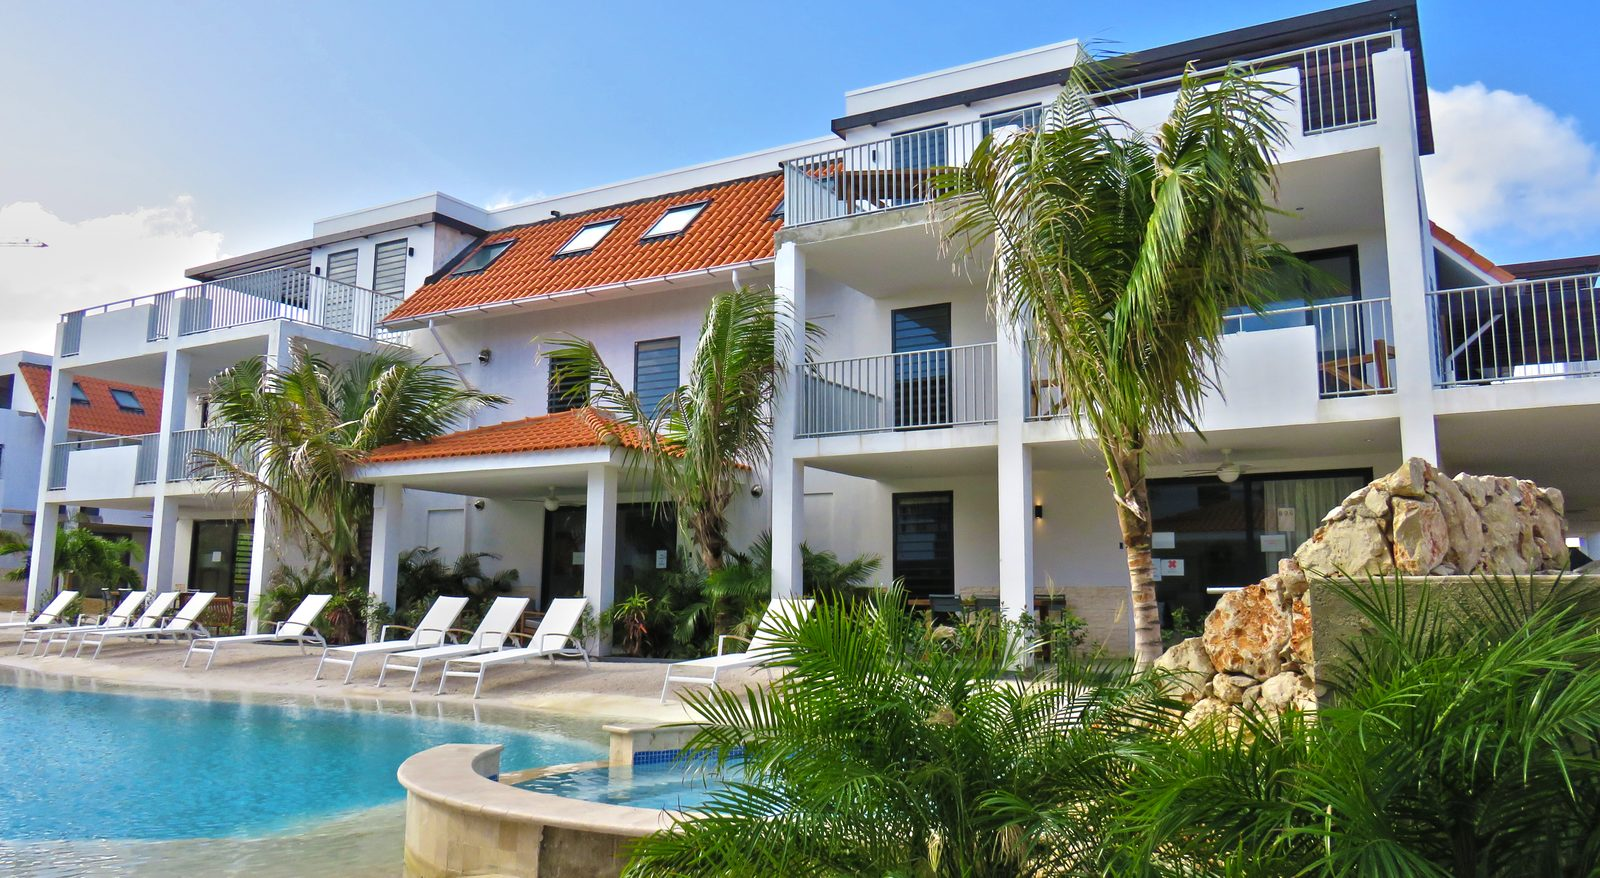 Vakantiewoning op Bonaire